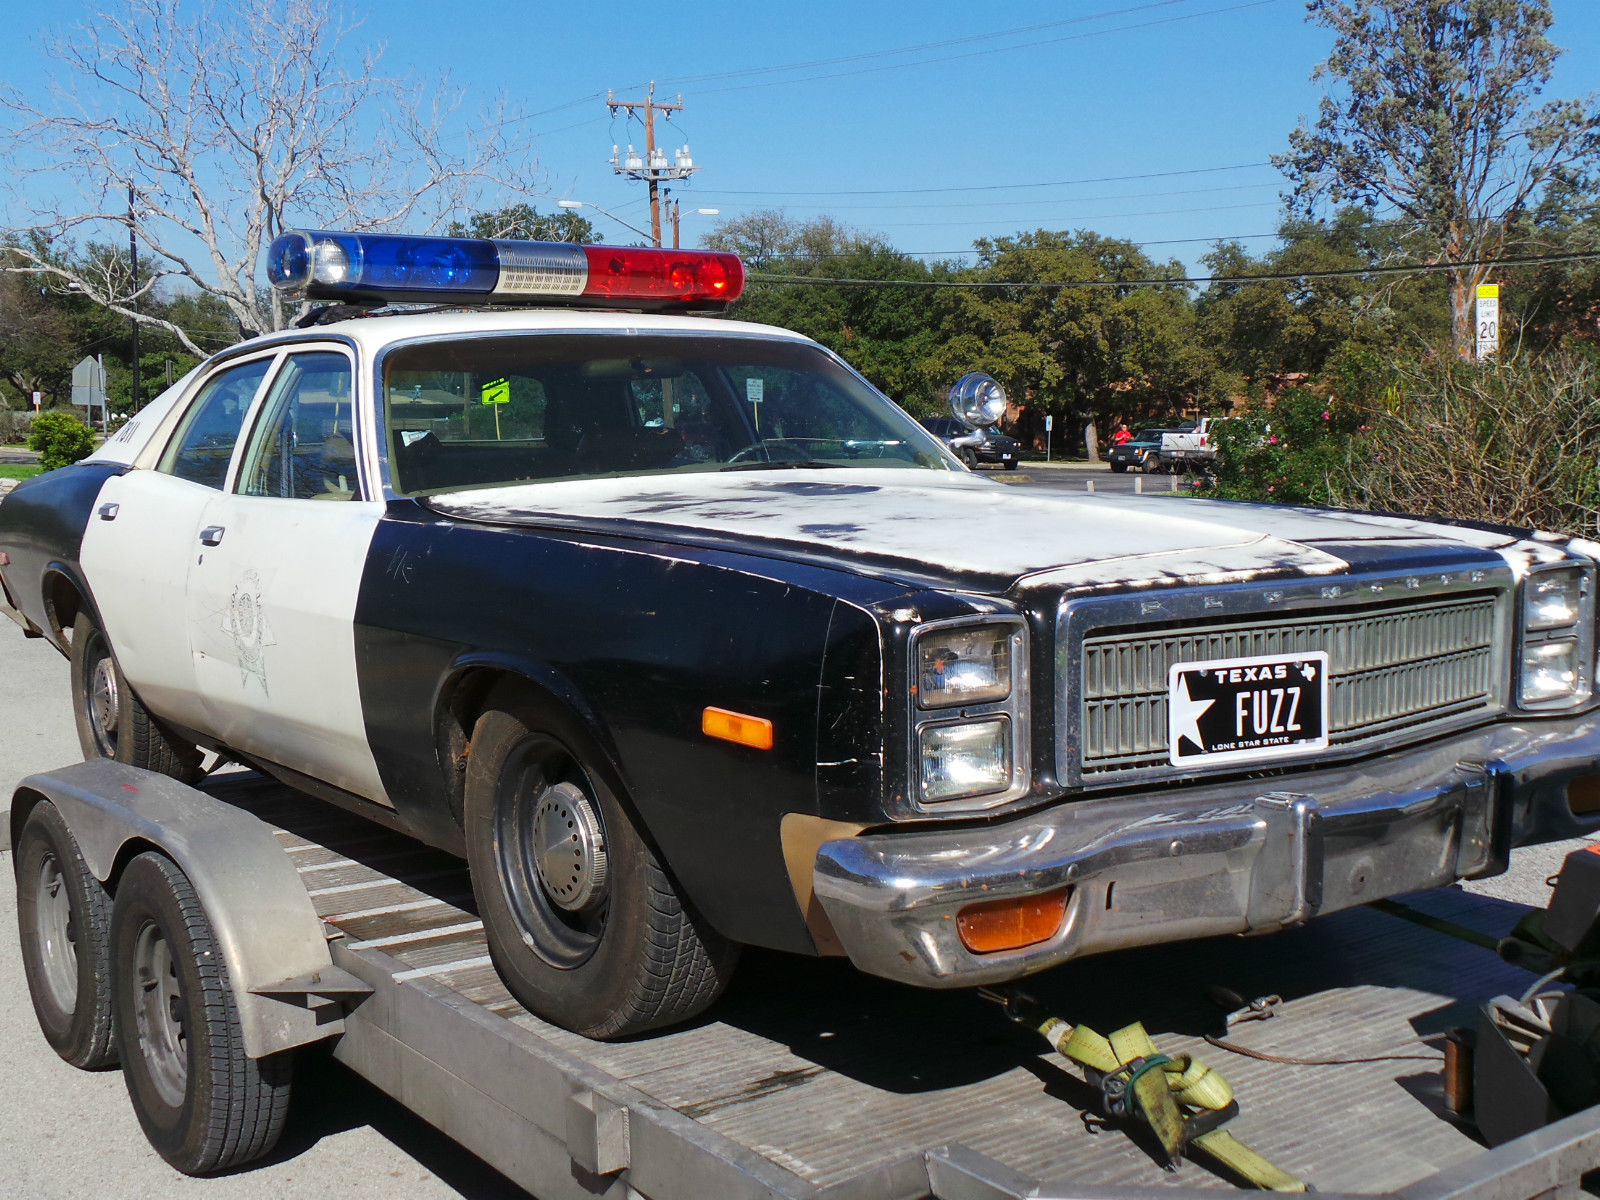 1978 Plymouth Fury Police Car Original Tulsa Police Car